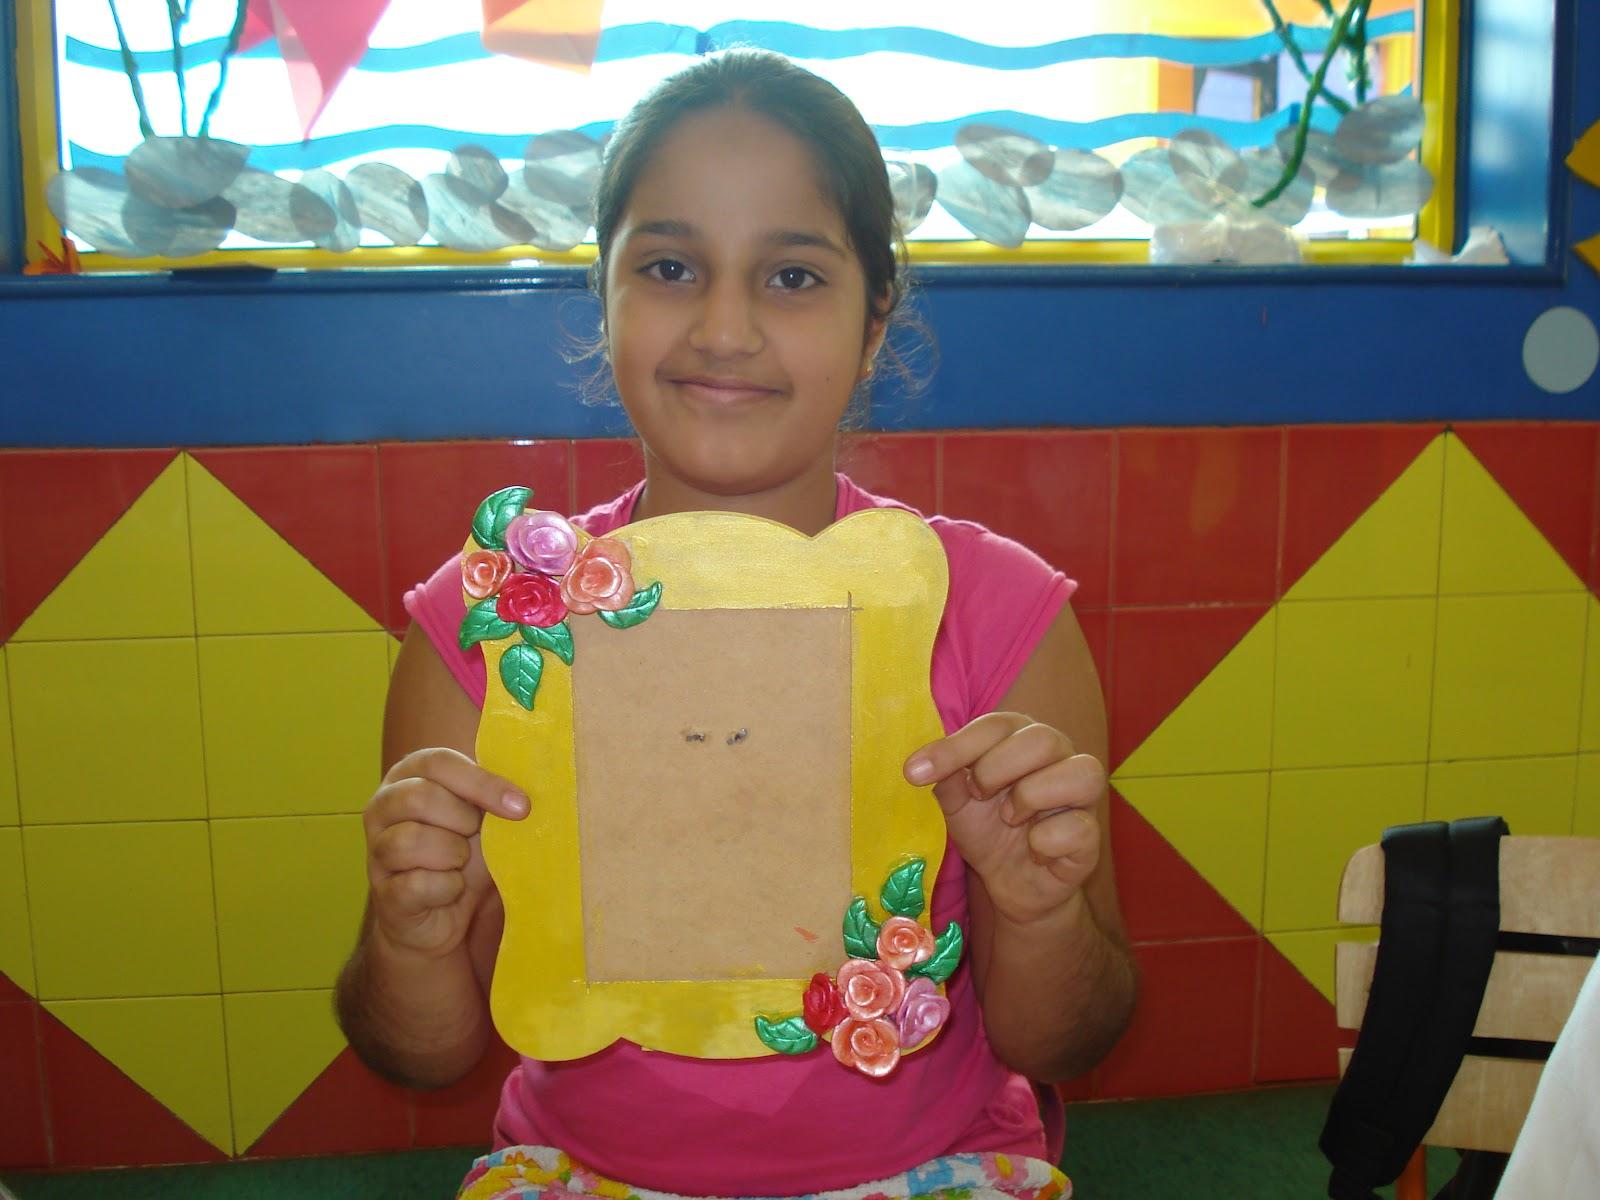 Arts And Crafts Ideas For Kids Summer Camp Part - 39: Summer Workshop For Kids